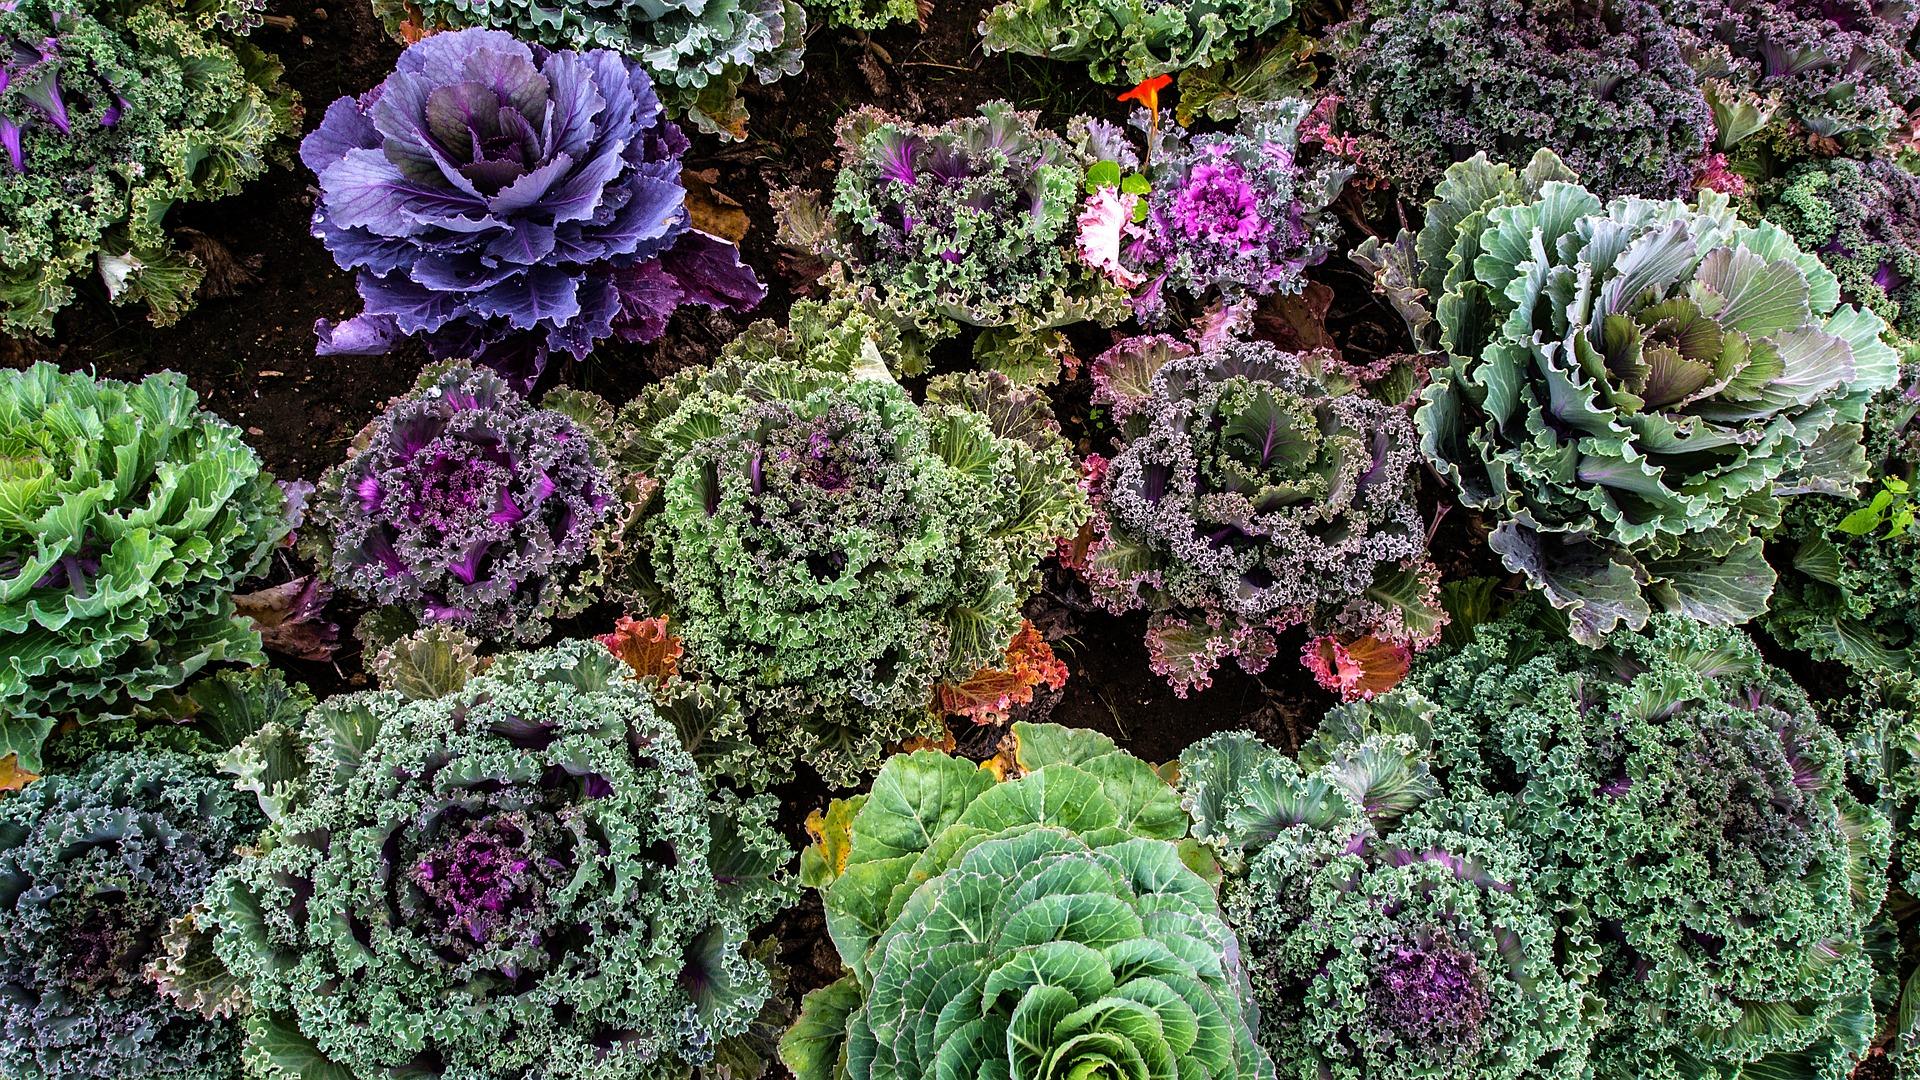 Beautiful kale plants